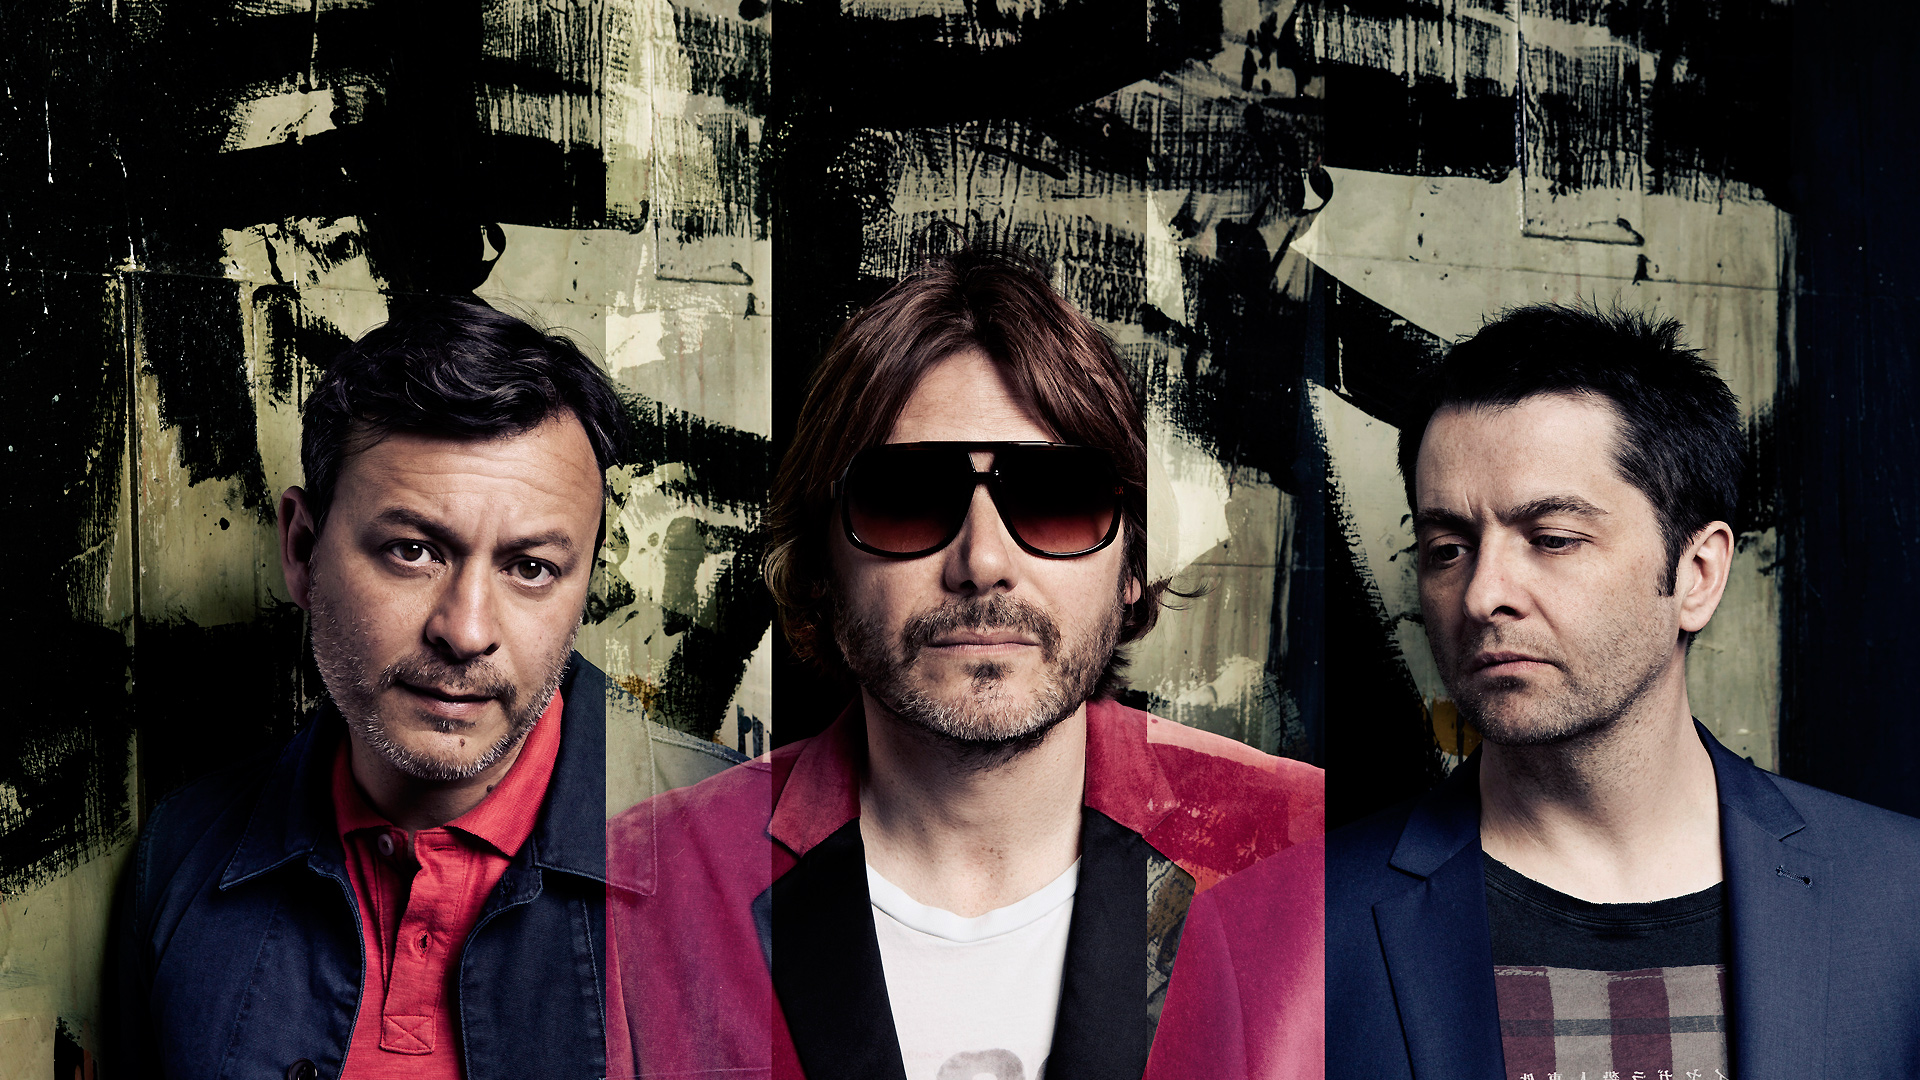 Manic Street Preachers | Music fanart | fanart.tv